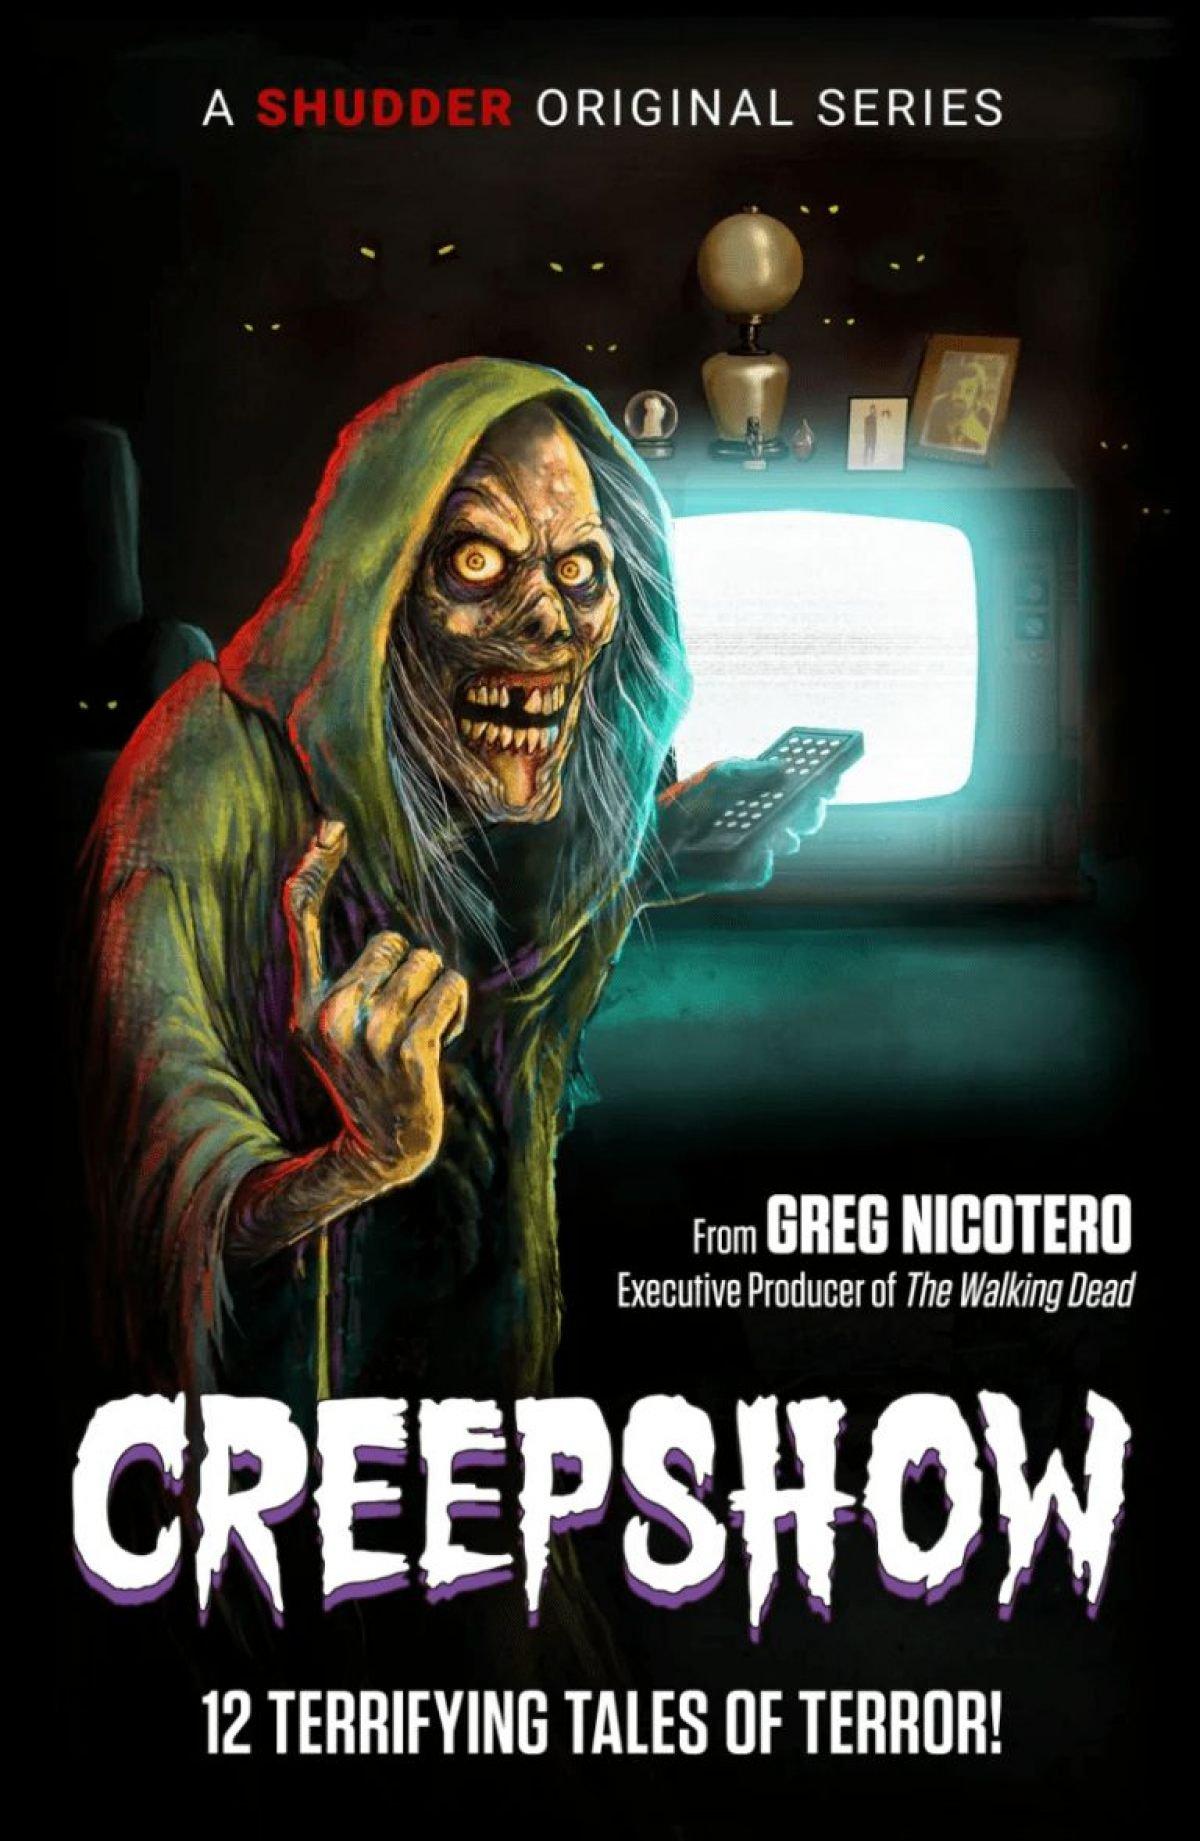 'Creepshow' key art. [Shudder]